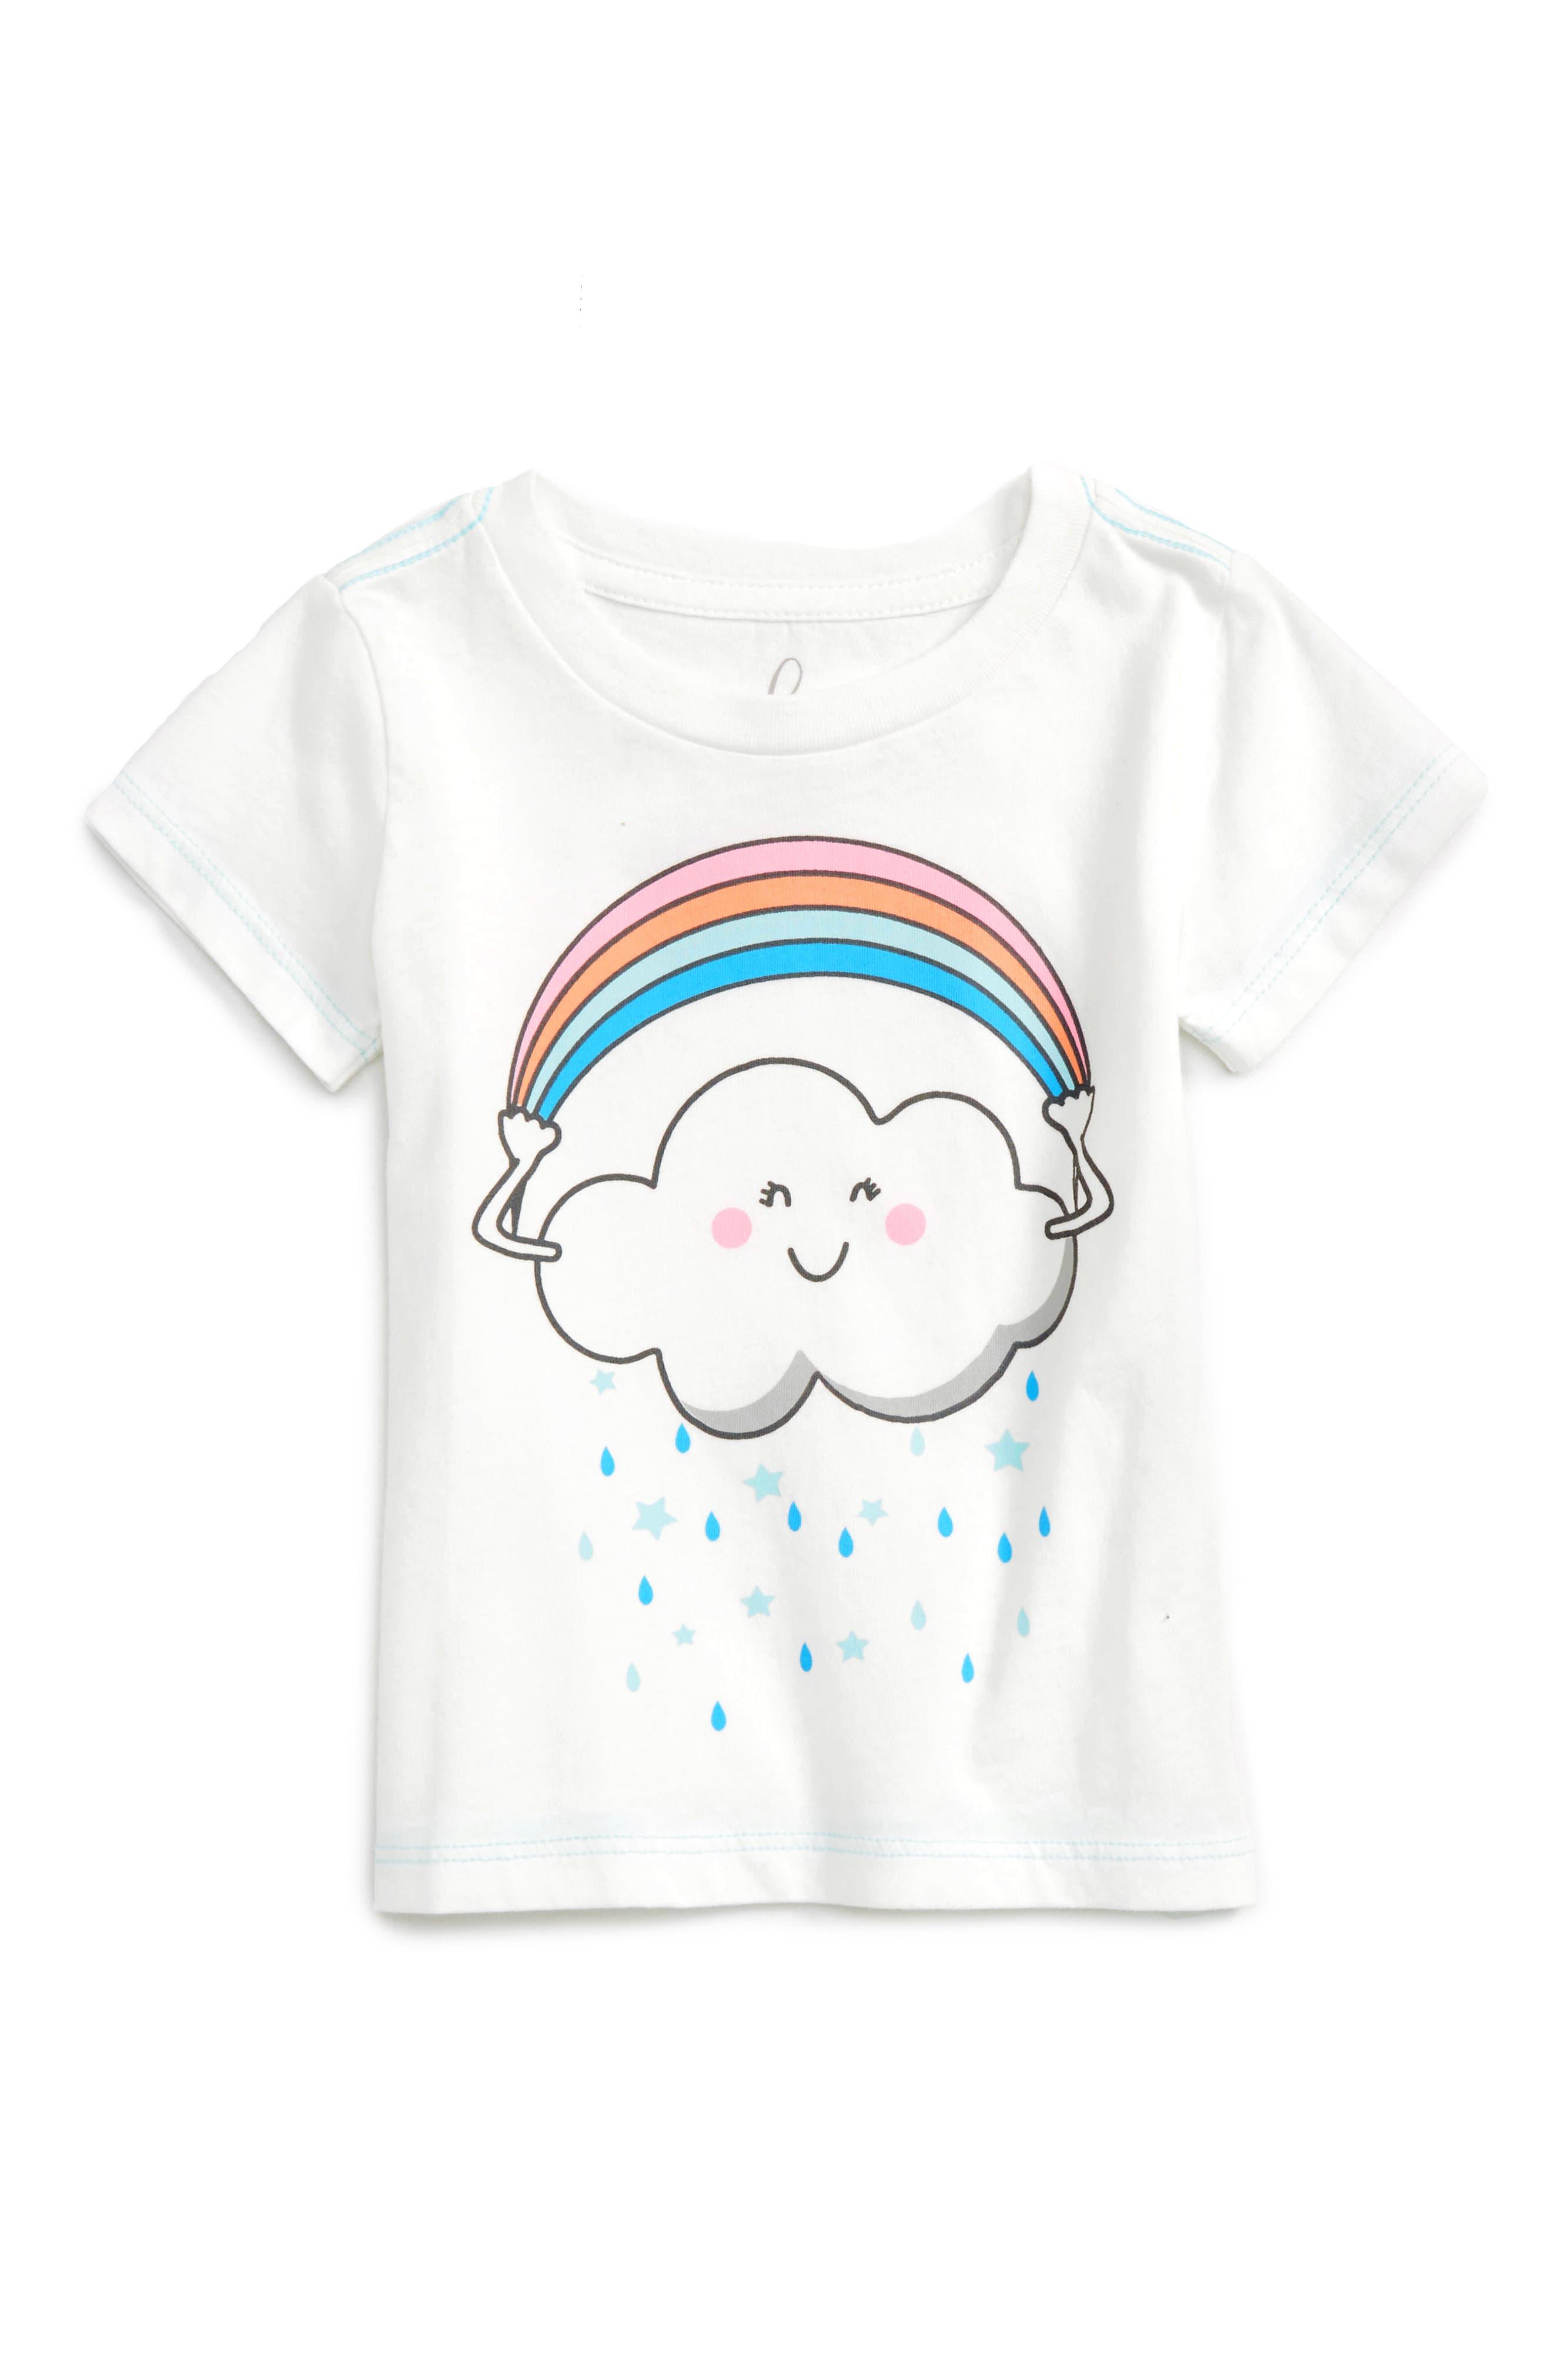 PEEK ESSENTIALS Peek Rainbow Cloud Tee